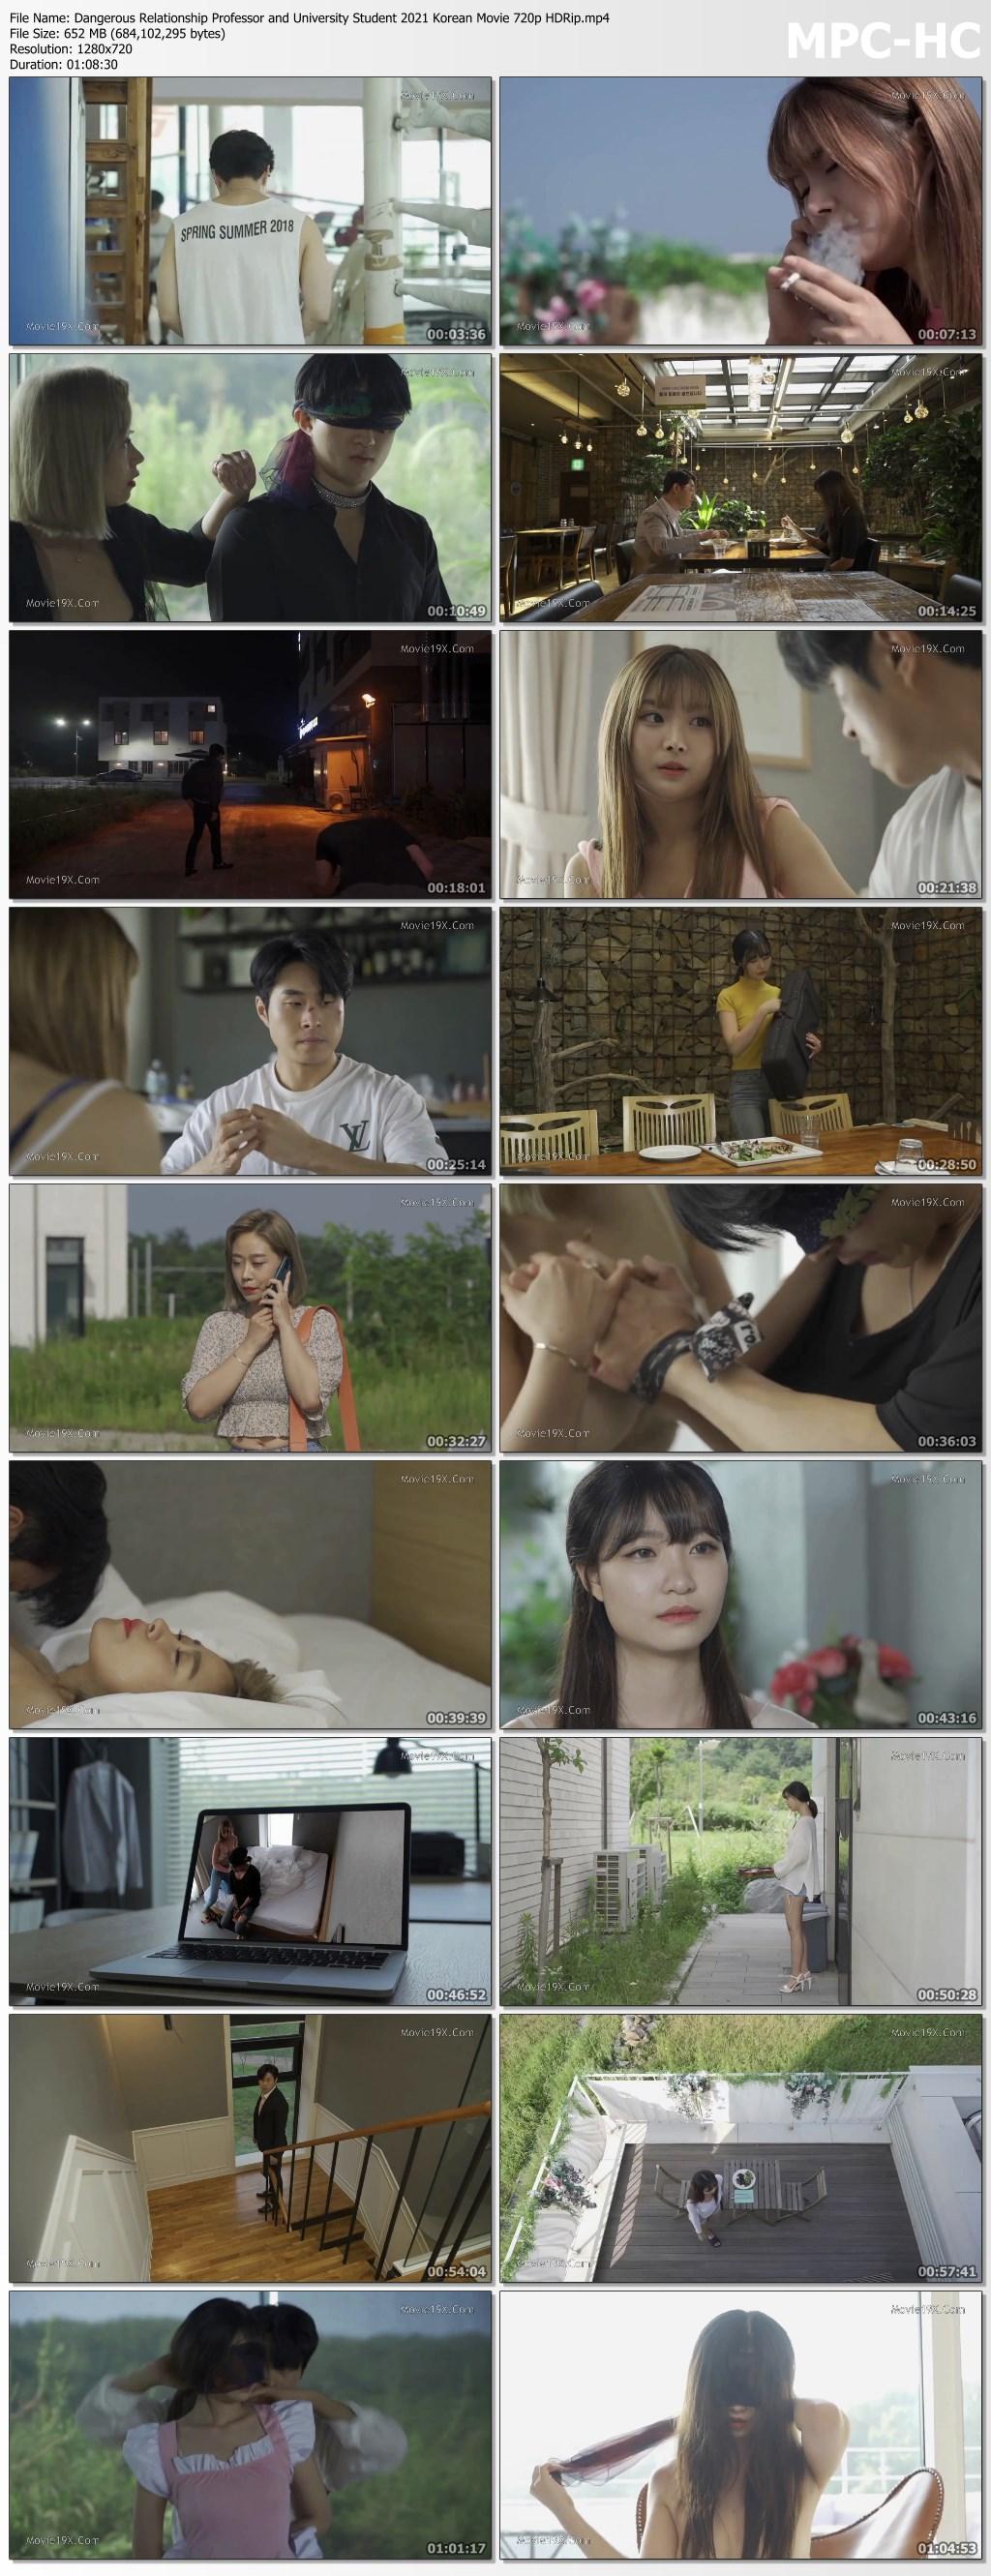 Dangerous Relationship Professor and University Student 2021 Korean Movie 720p HDRip.mp4 thumbs